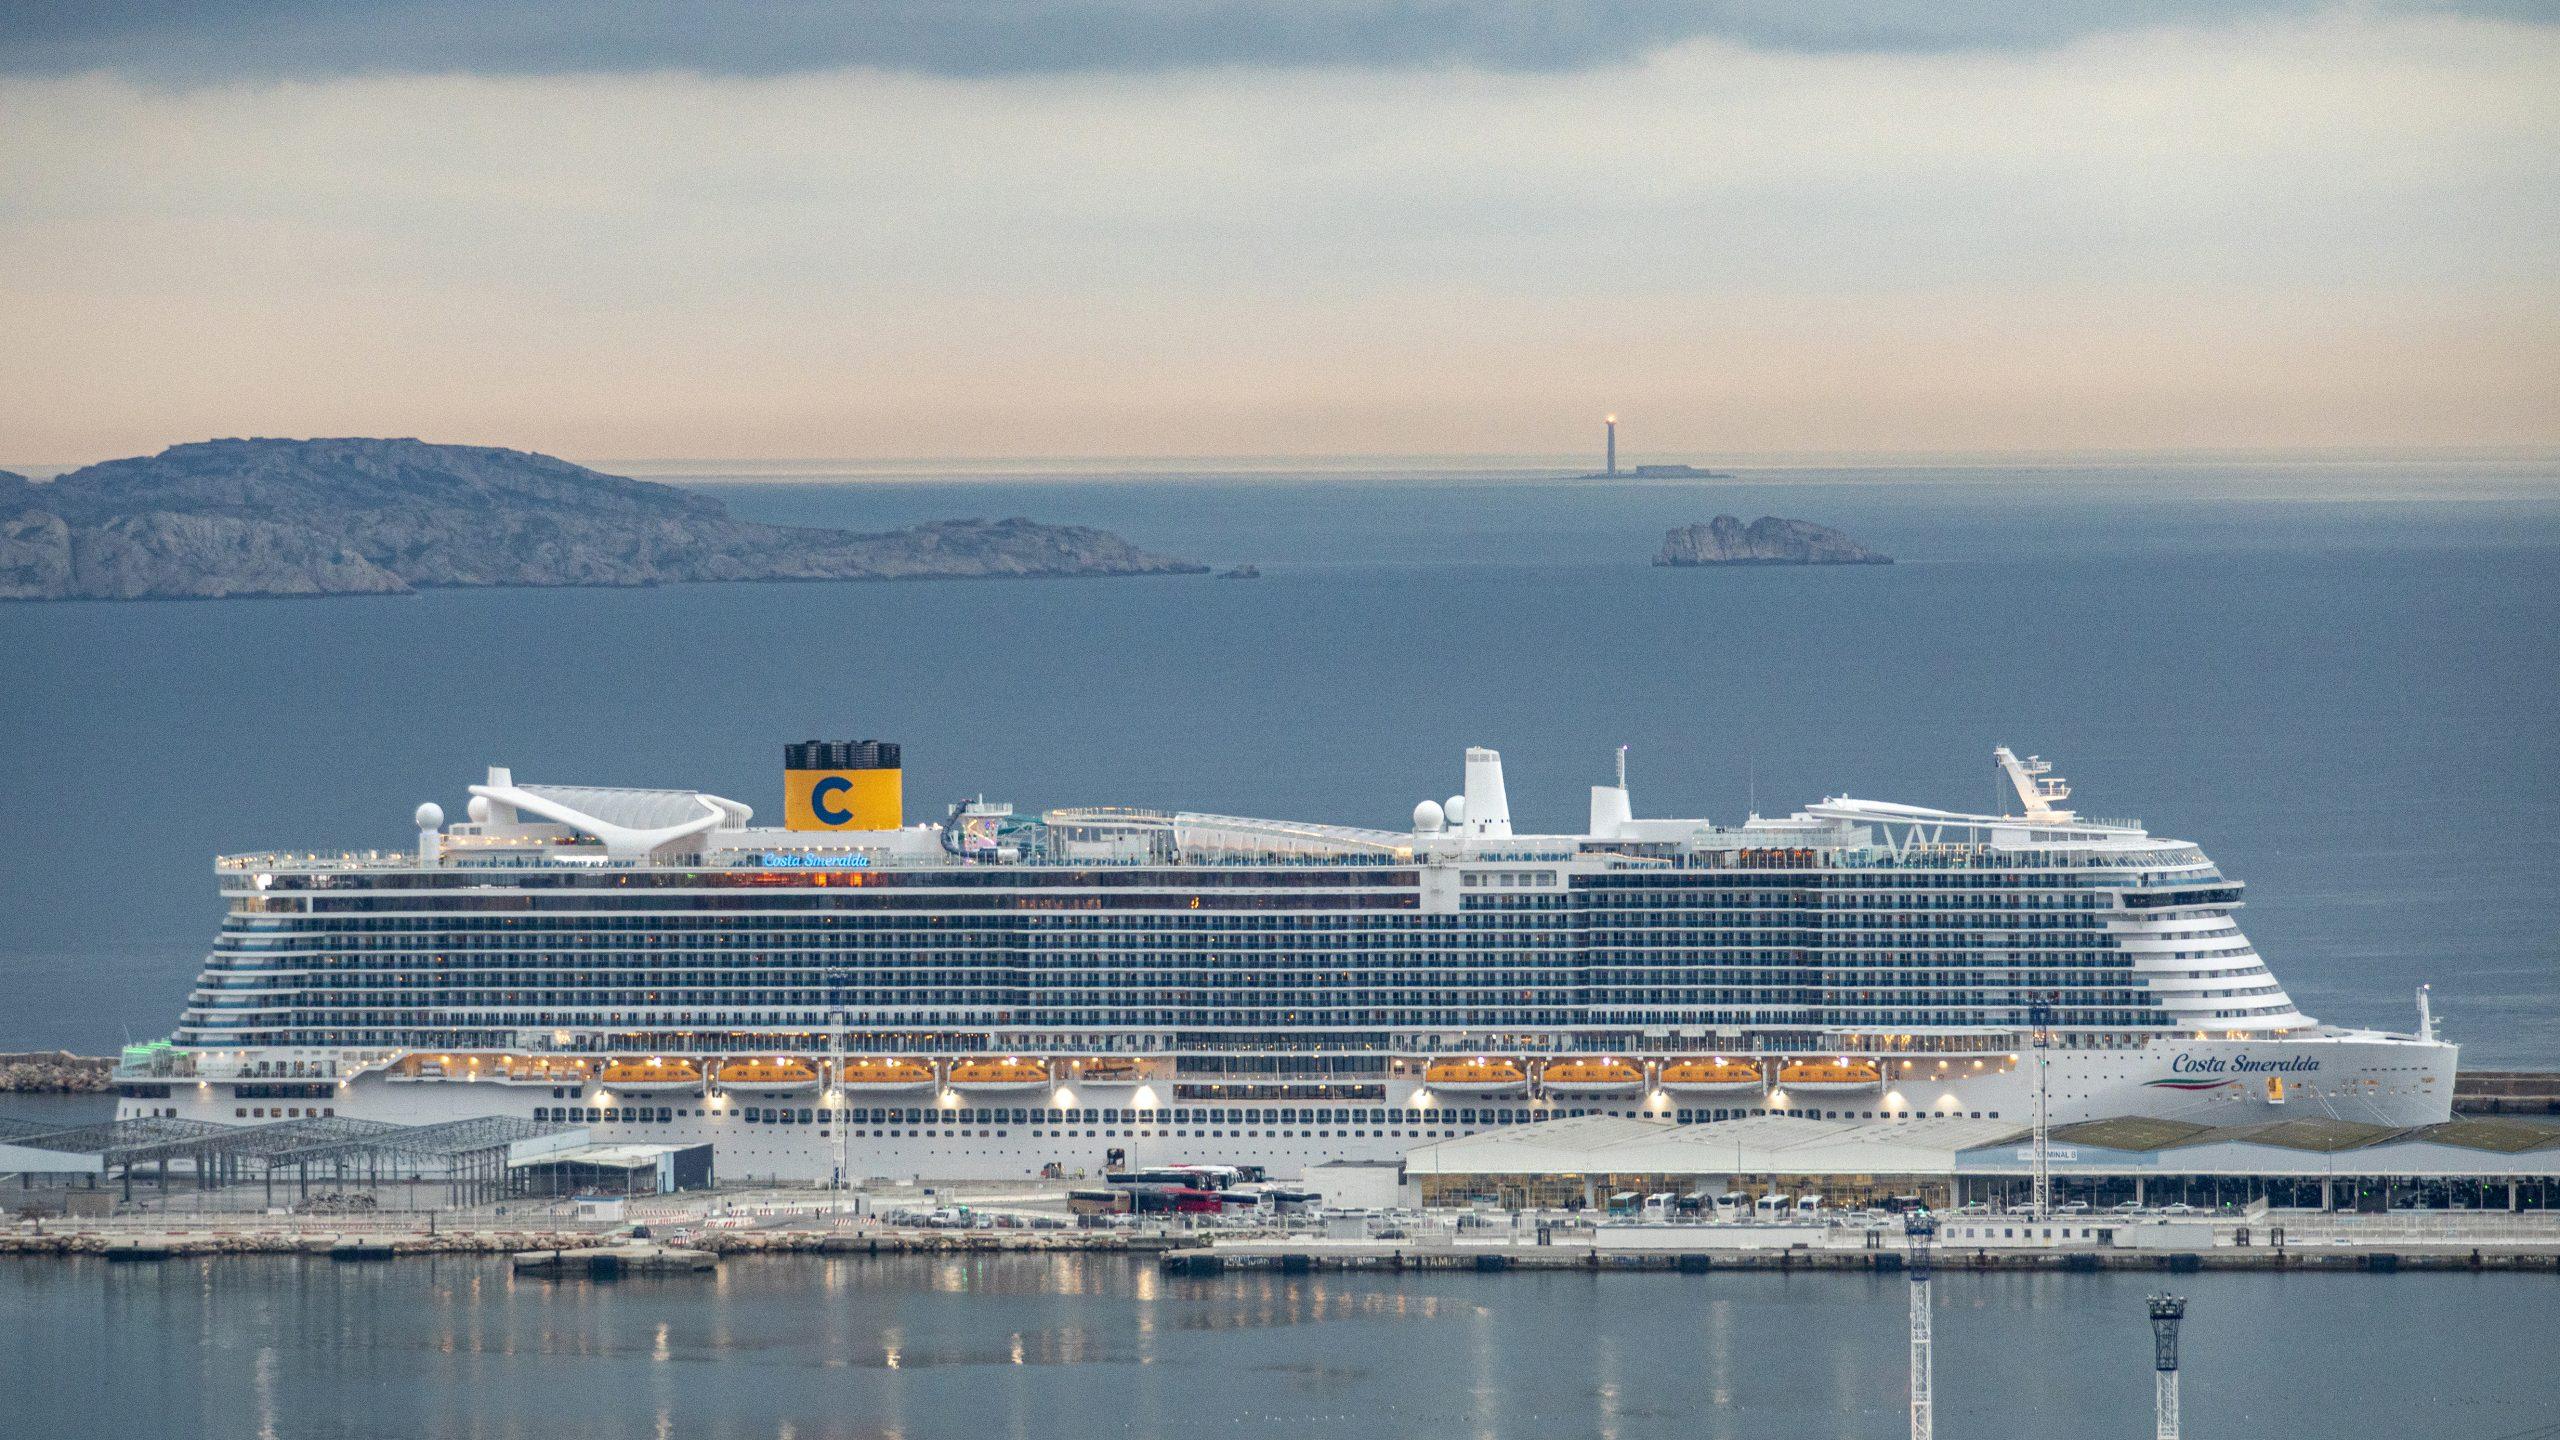 Costa Smeralda. Cruceros para familias numerosas